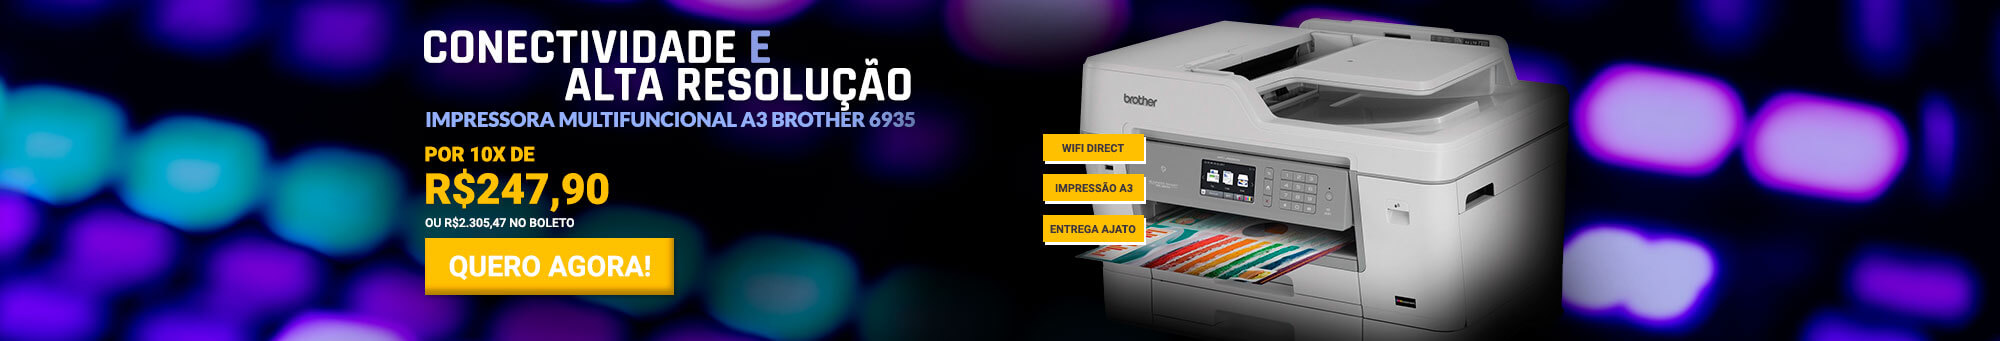 Multifuncional Brother 6935